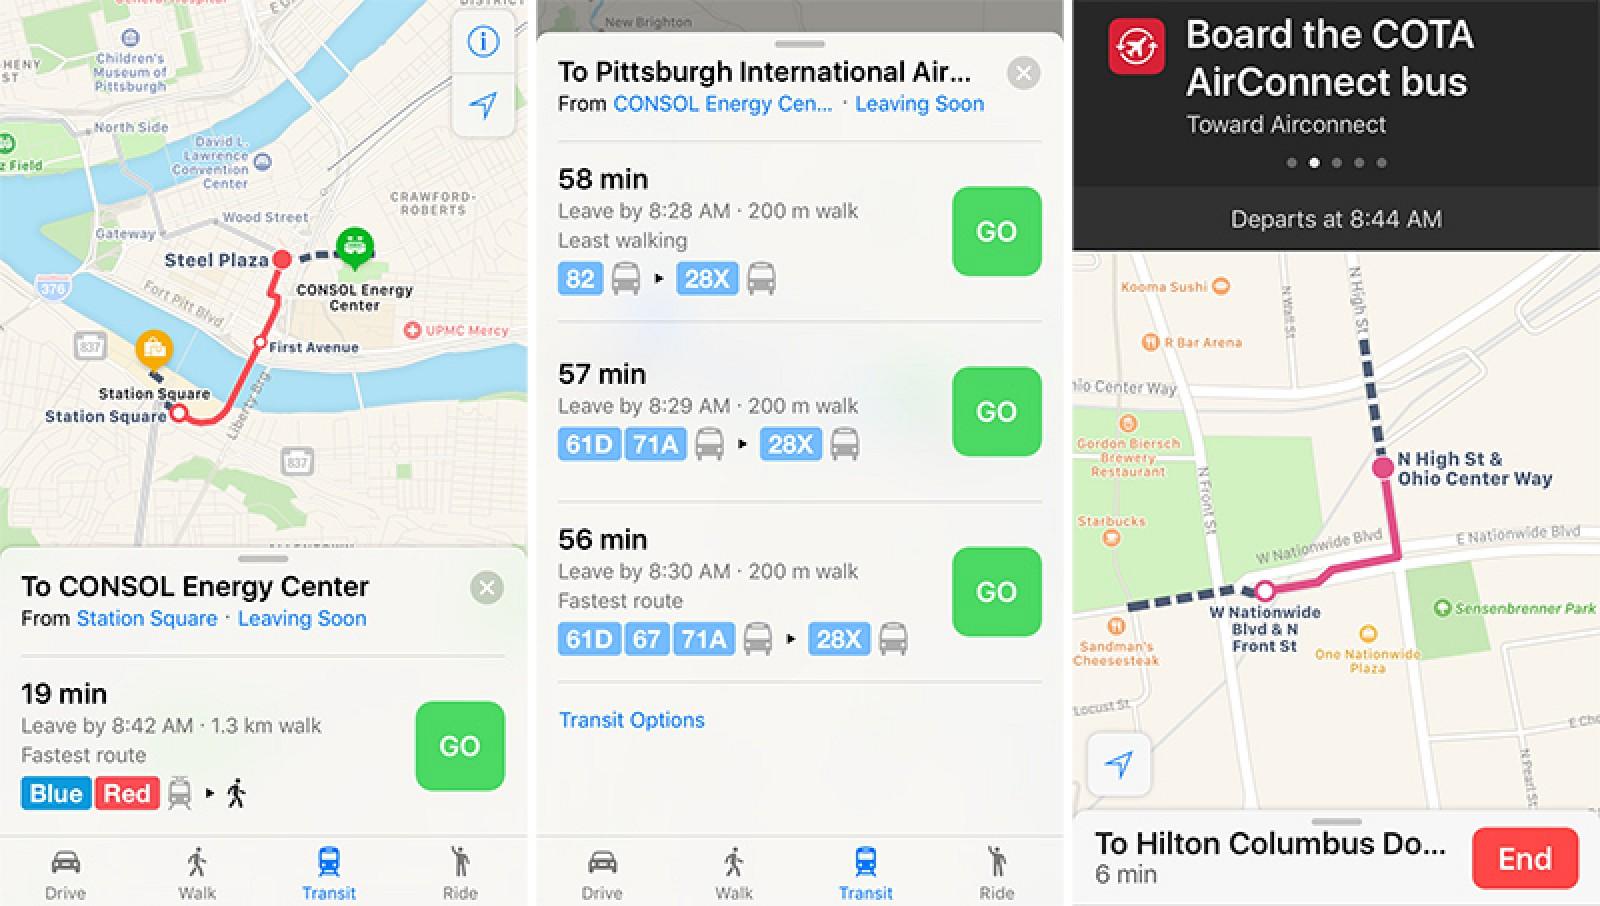 Apple Maps Expands Transit Data to Columbus and Pittsburgh - Mac Rumors